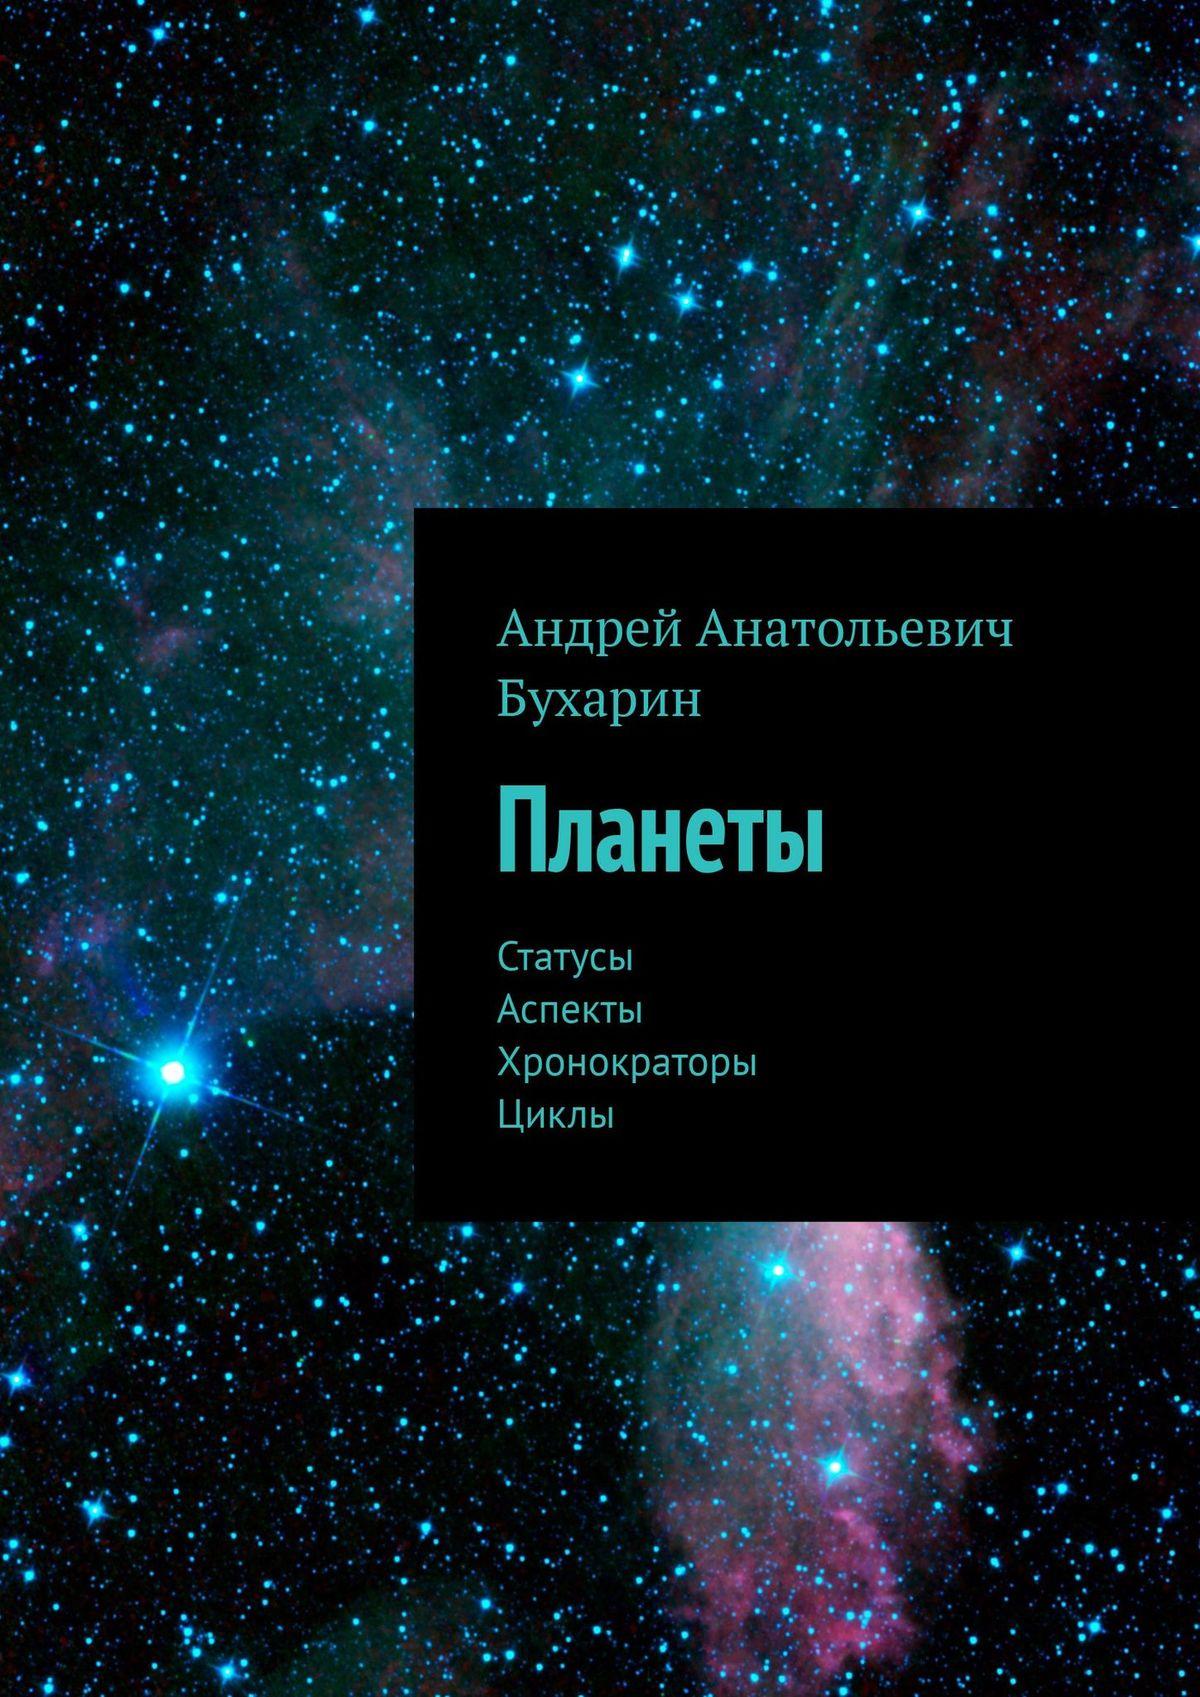 Андрей Анатольевич Бухарин Планеты. Статусы, хронократоры, циклы цены онлайн